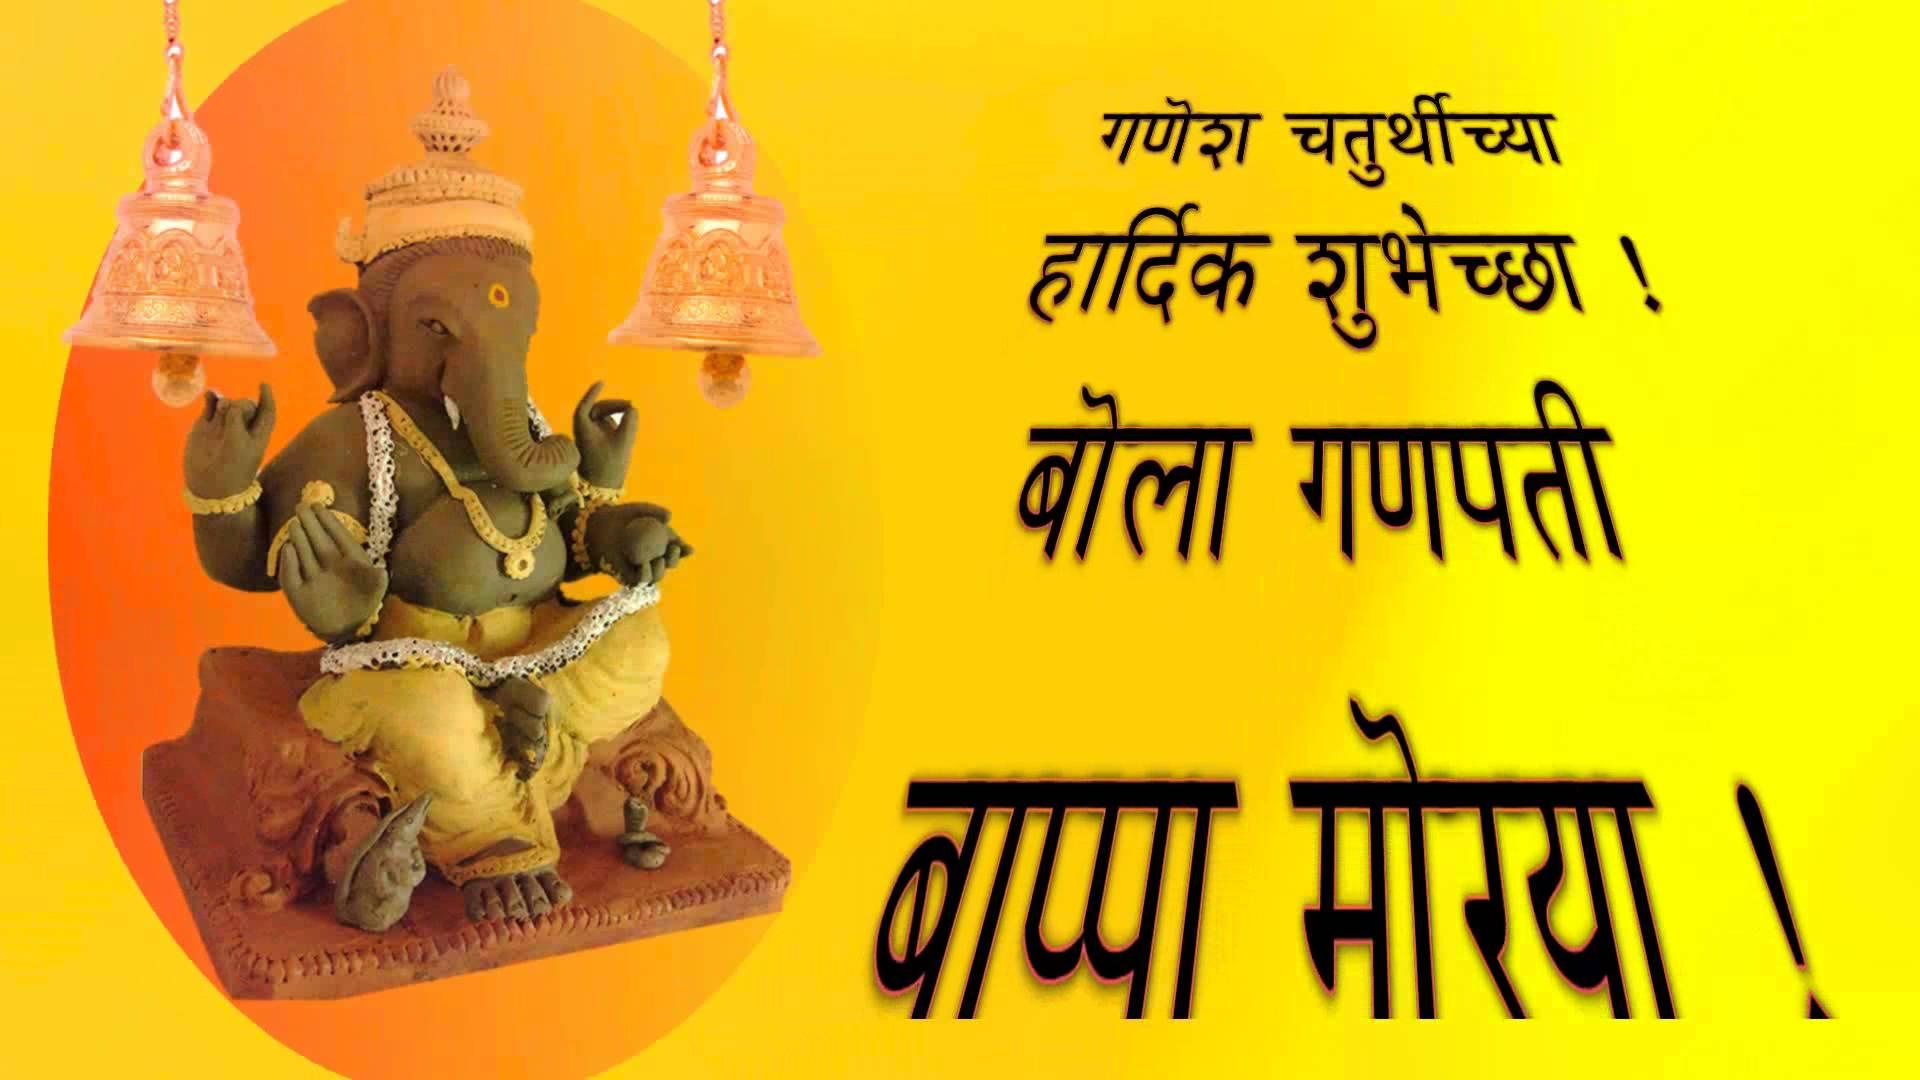 Ganesh Chaturthi 2016 Messages in Marathi